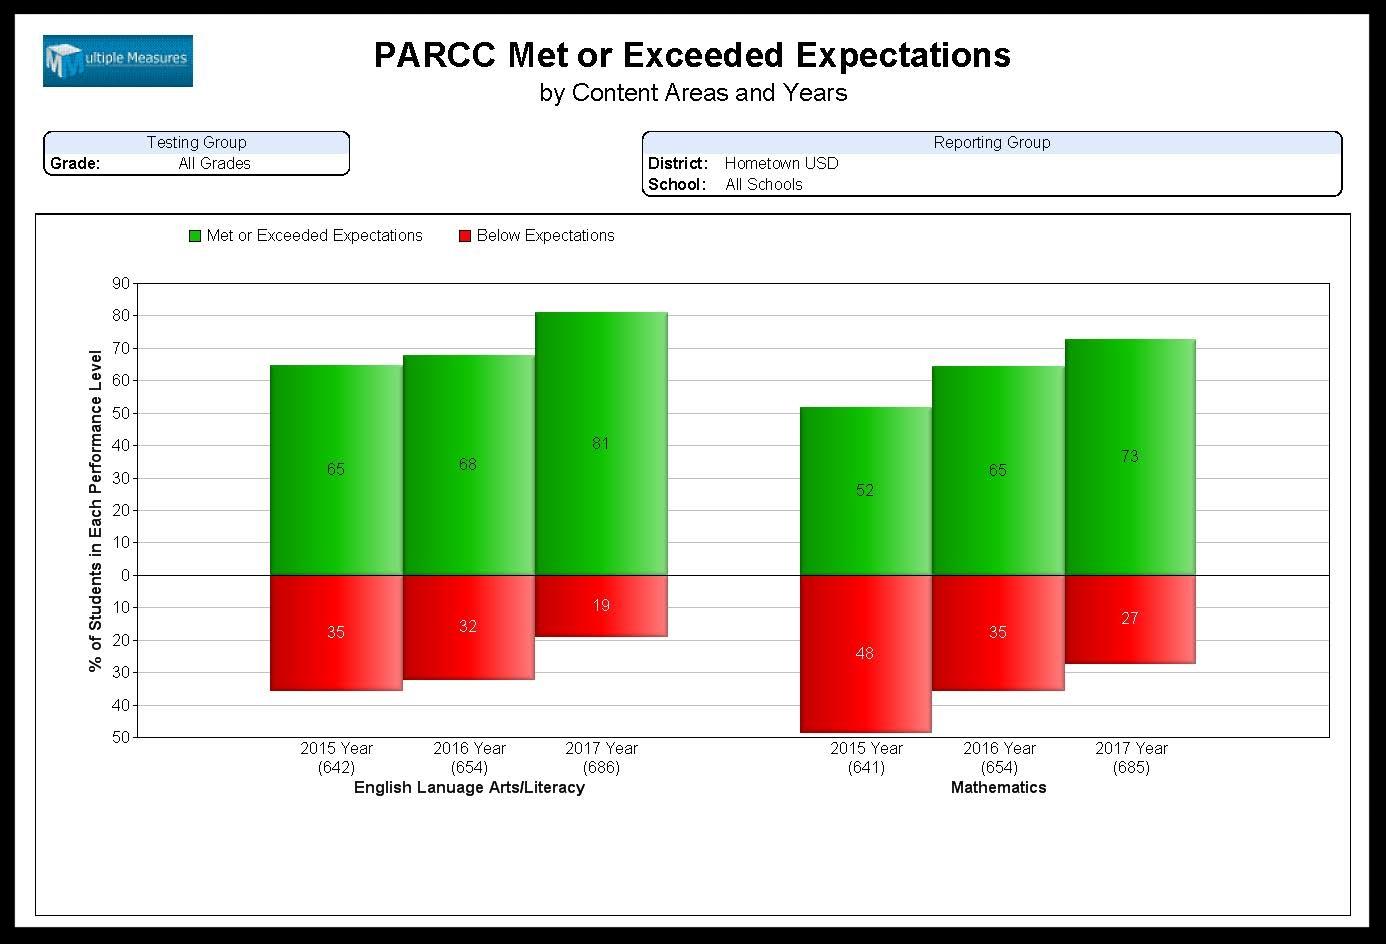 PARCC-Summary_MetorExceeded_CATALOG.jpg